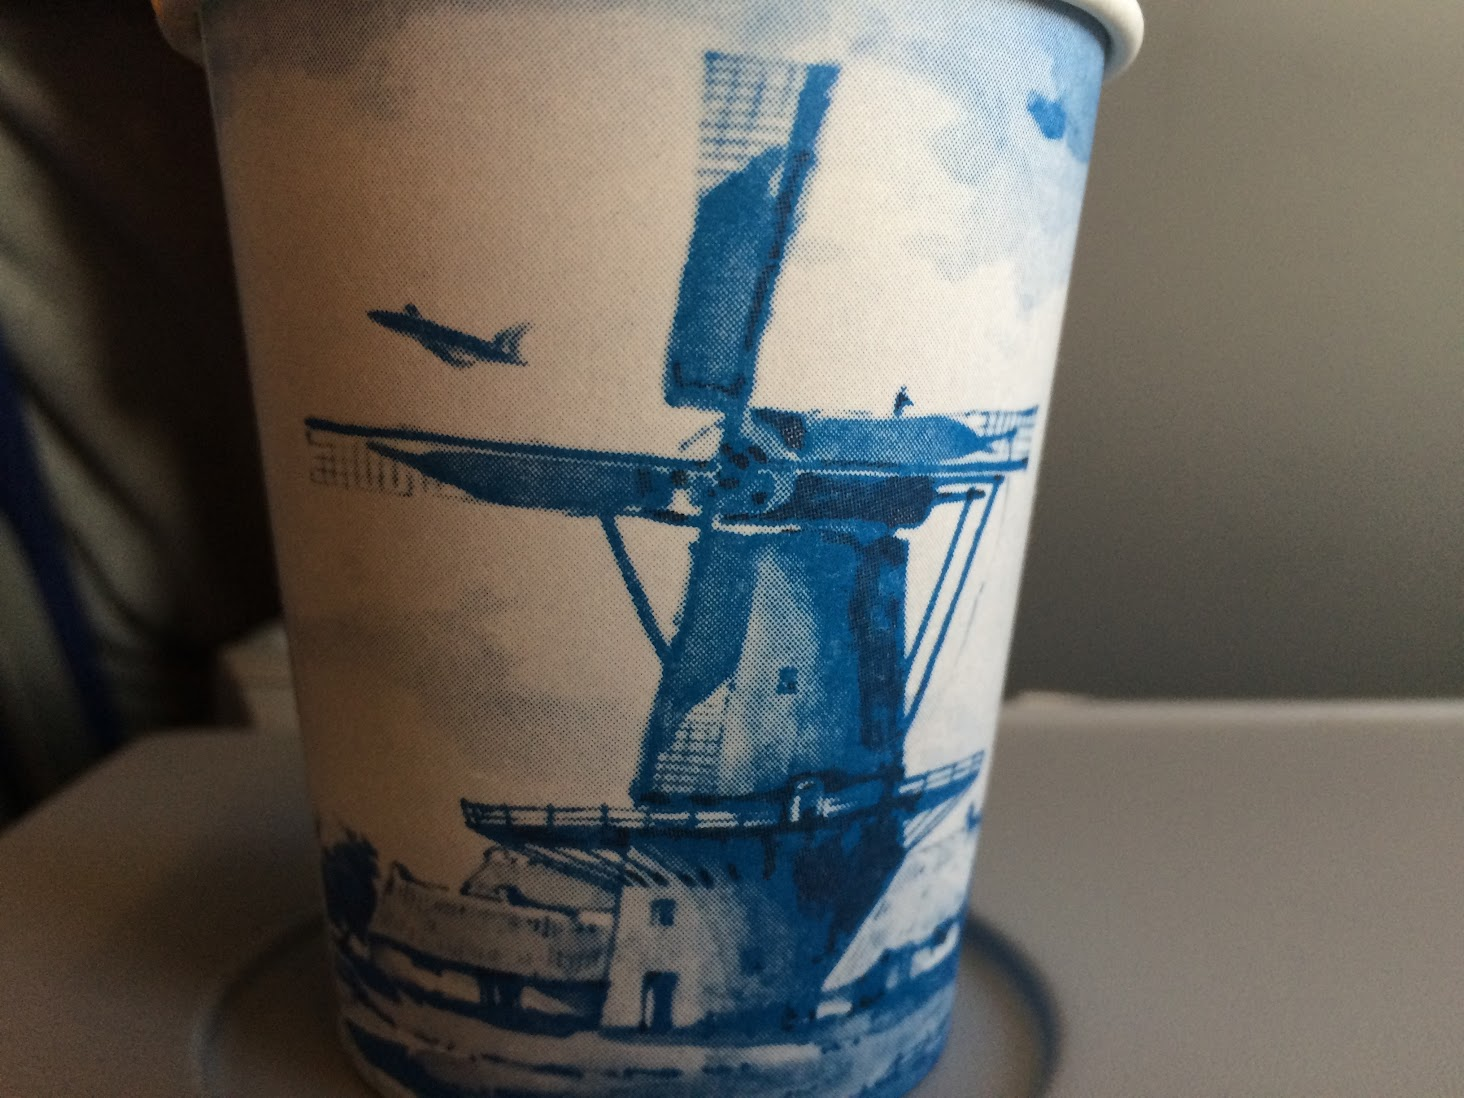 A KLM tea cup